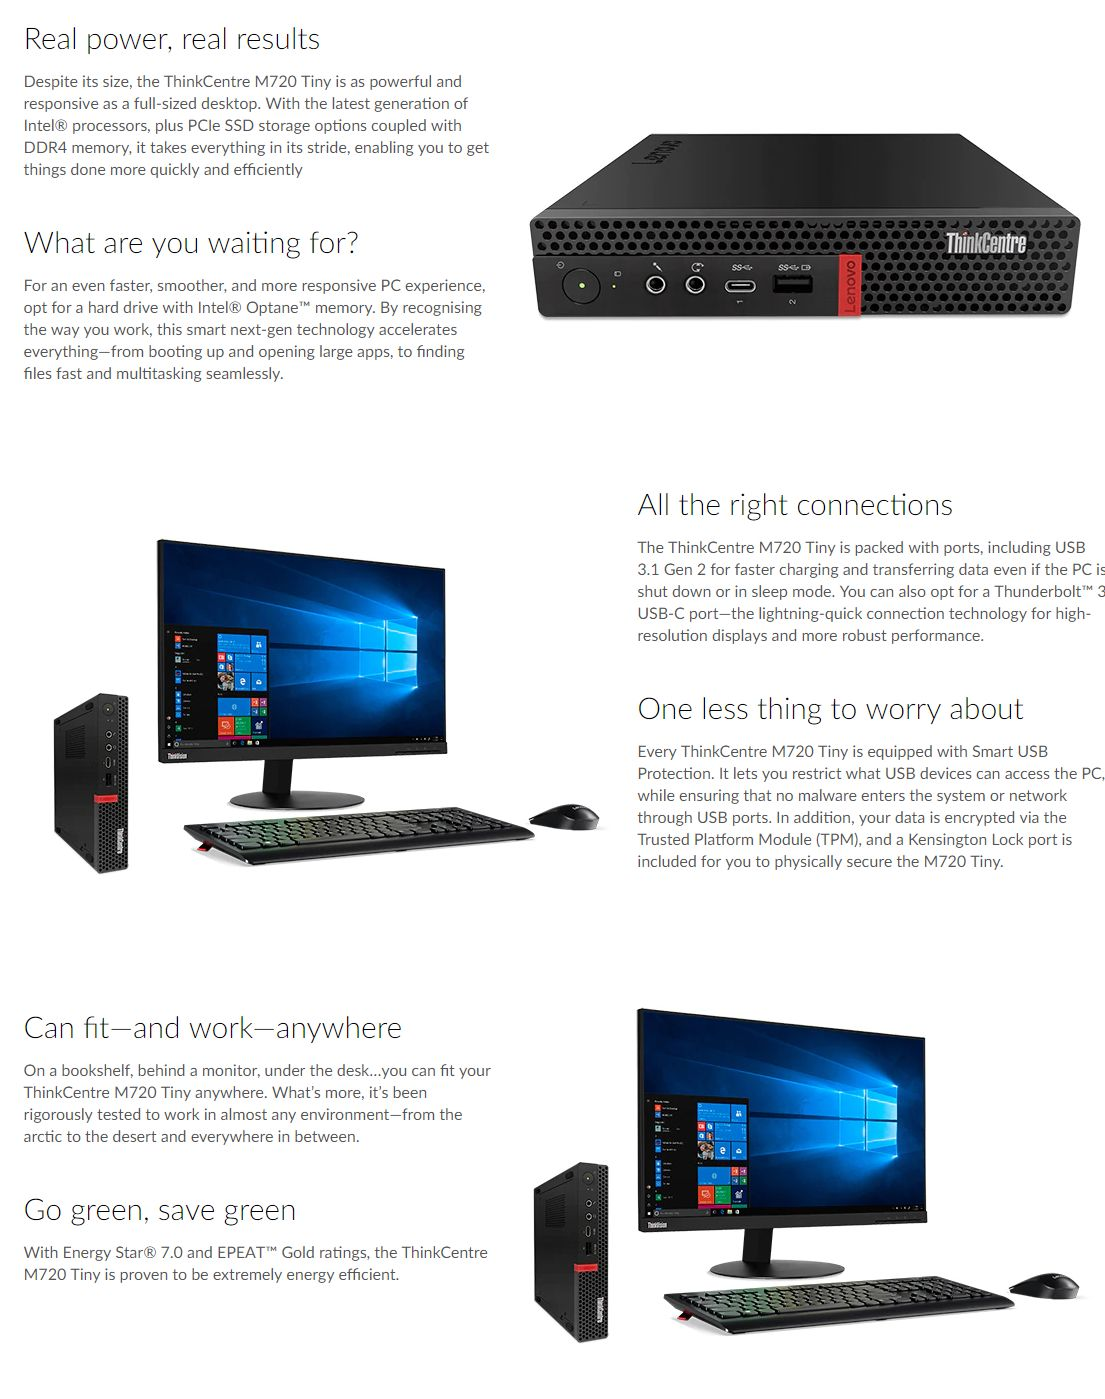 Lenovo ThinkCentre M720 Tiny i7-8700T 16GB DDR4 256GB SSD Wifi+BT KB/Mouse  W10 Pro